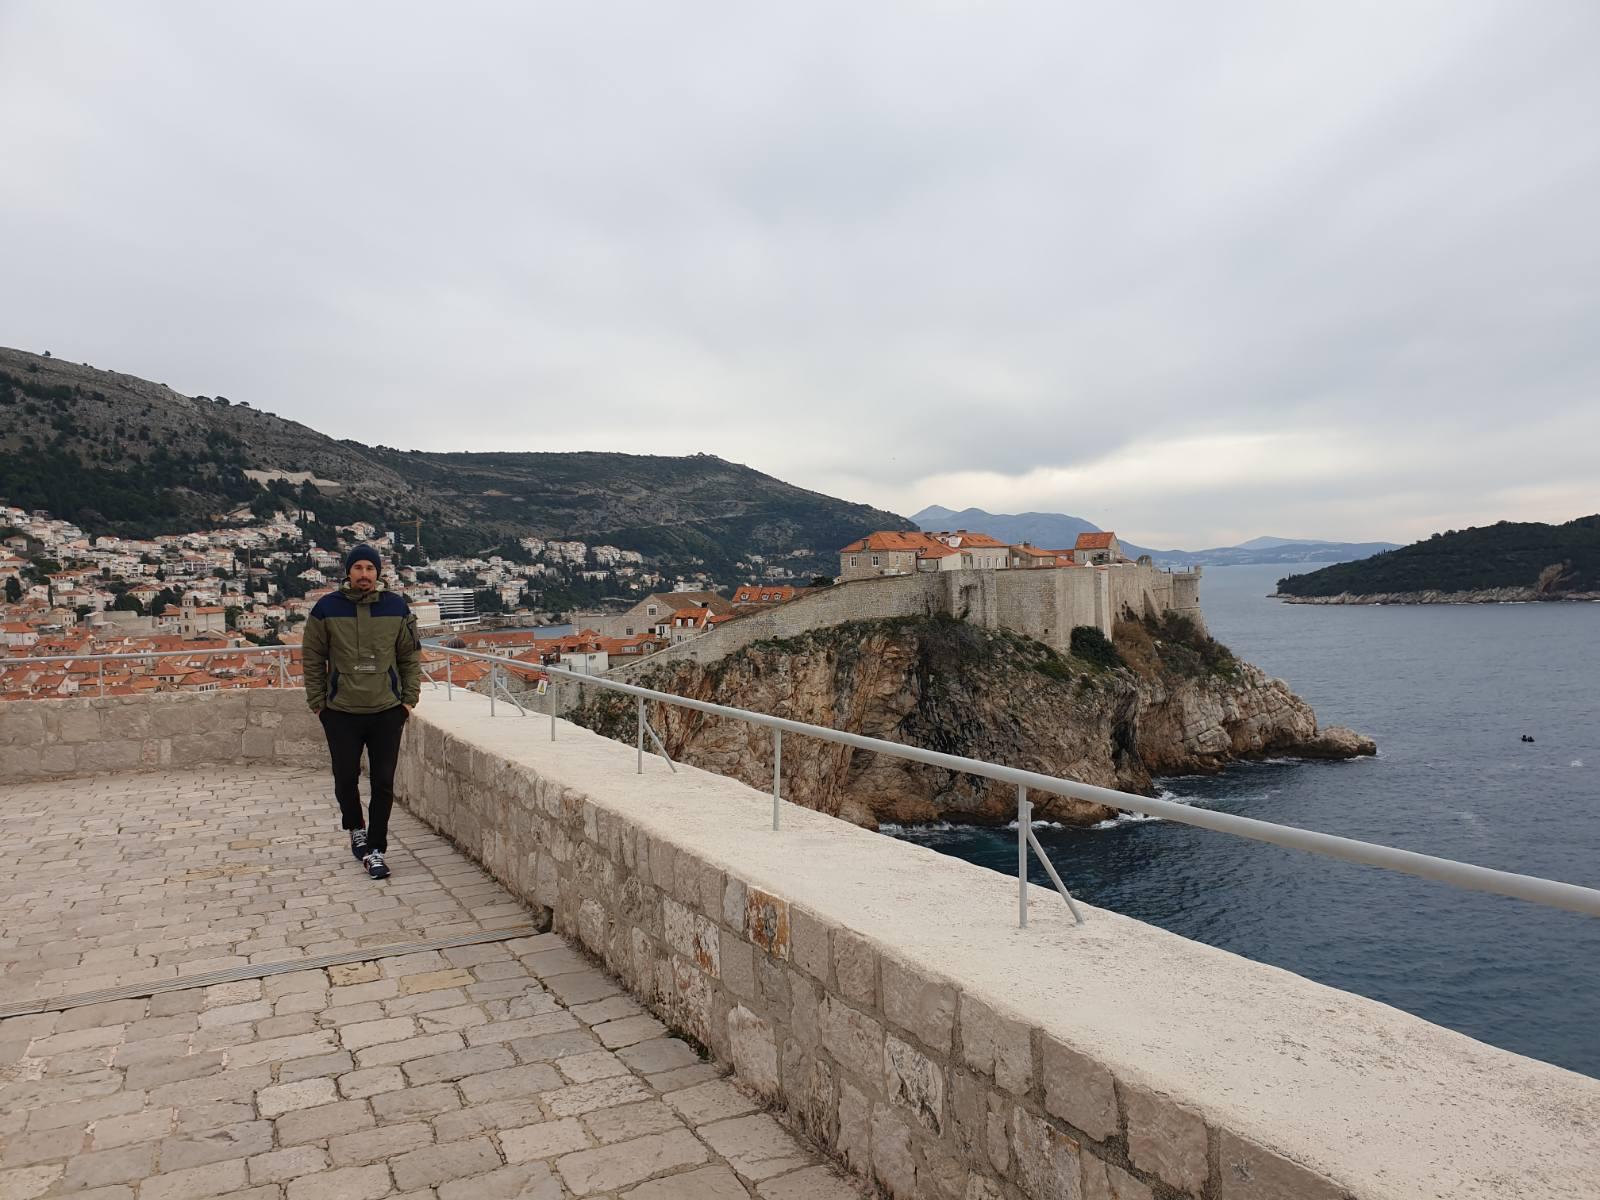 Luxury tourism dubrovnik villa